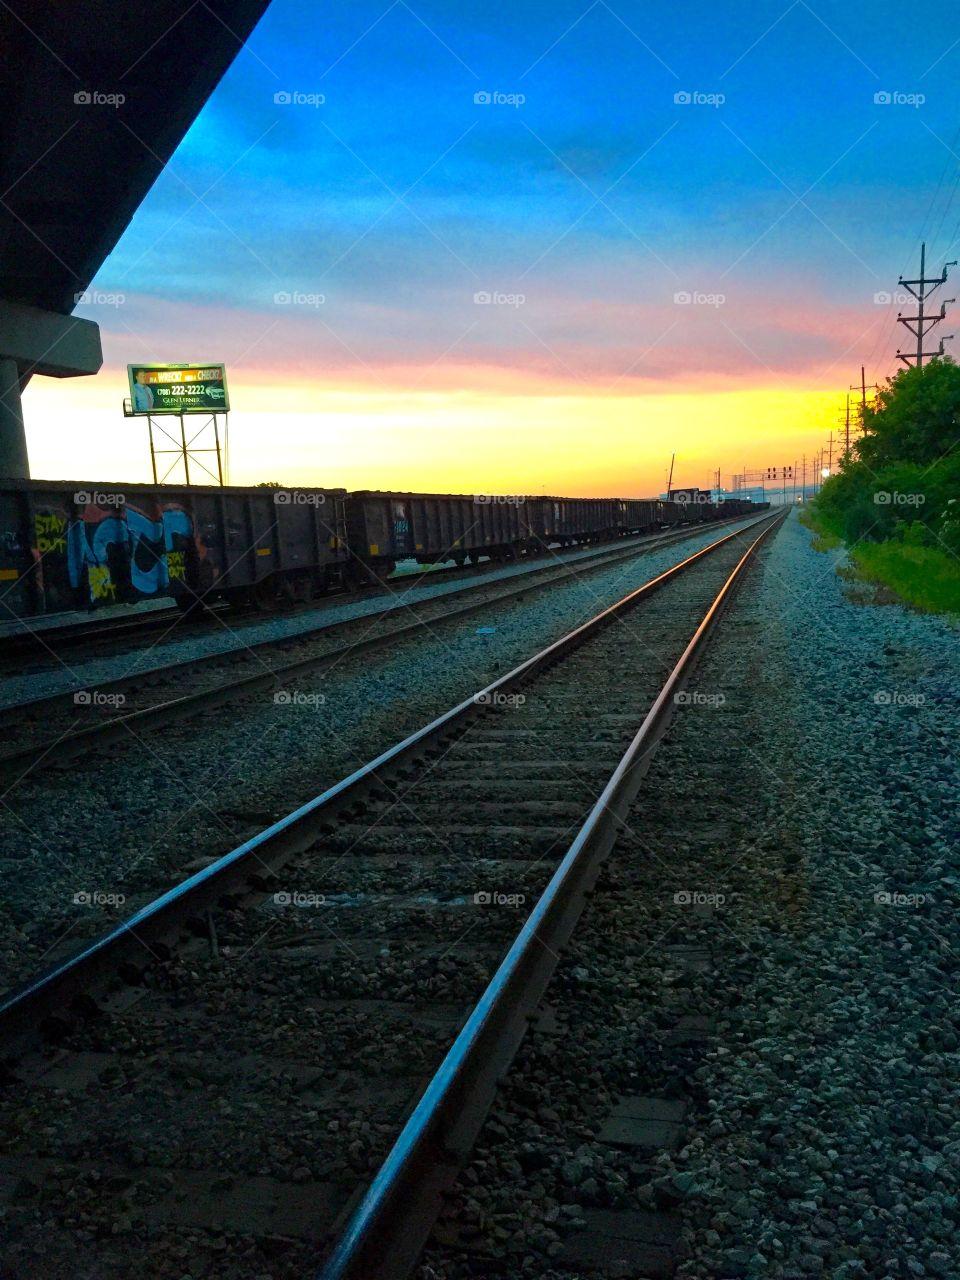 Locomotive, Railway, Train, Railroad Track, Transportation System